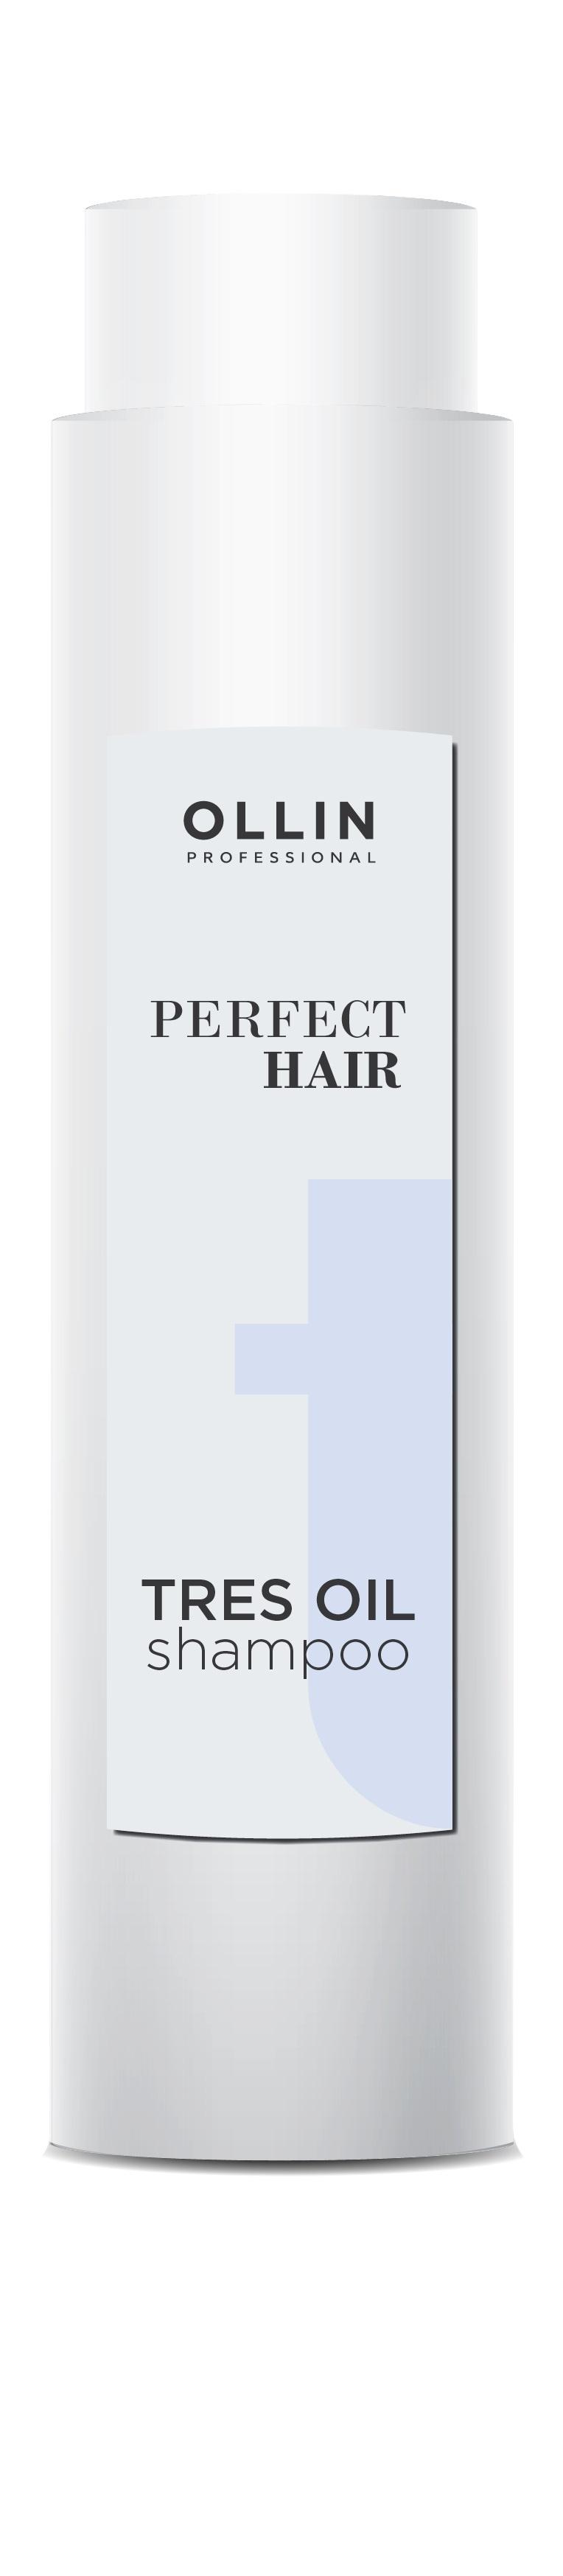 Шампунь для волос OLLIN PROFESSIONAL PERFECT HAIR для восстановления tres oil 400 мл шампунь ollin professional perfect hair tres oil 400 мл